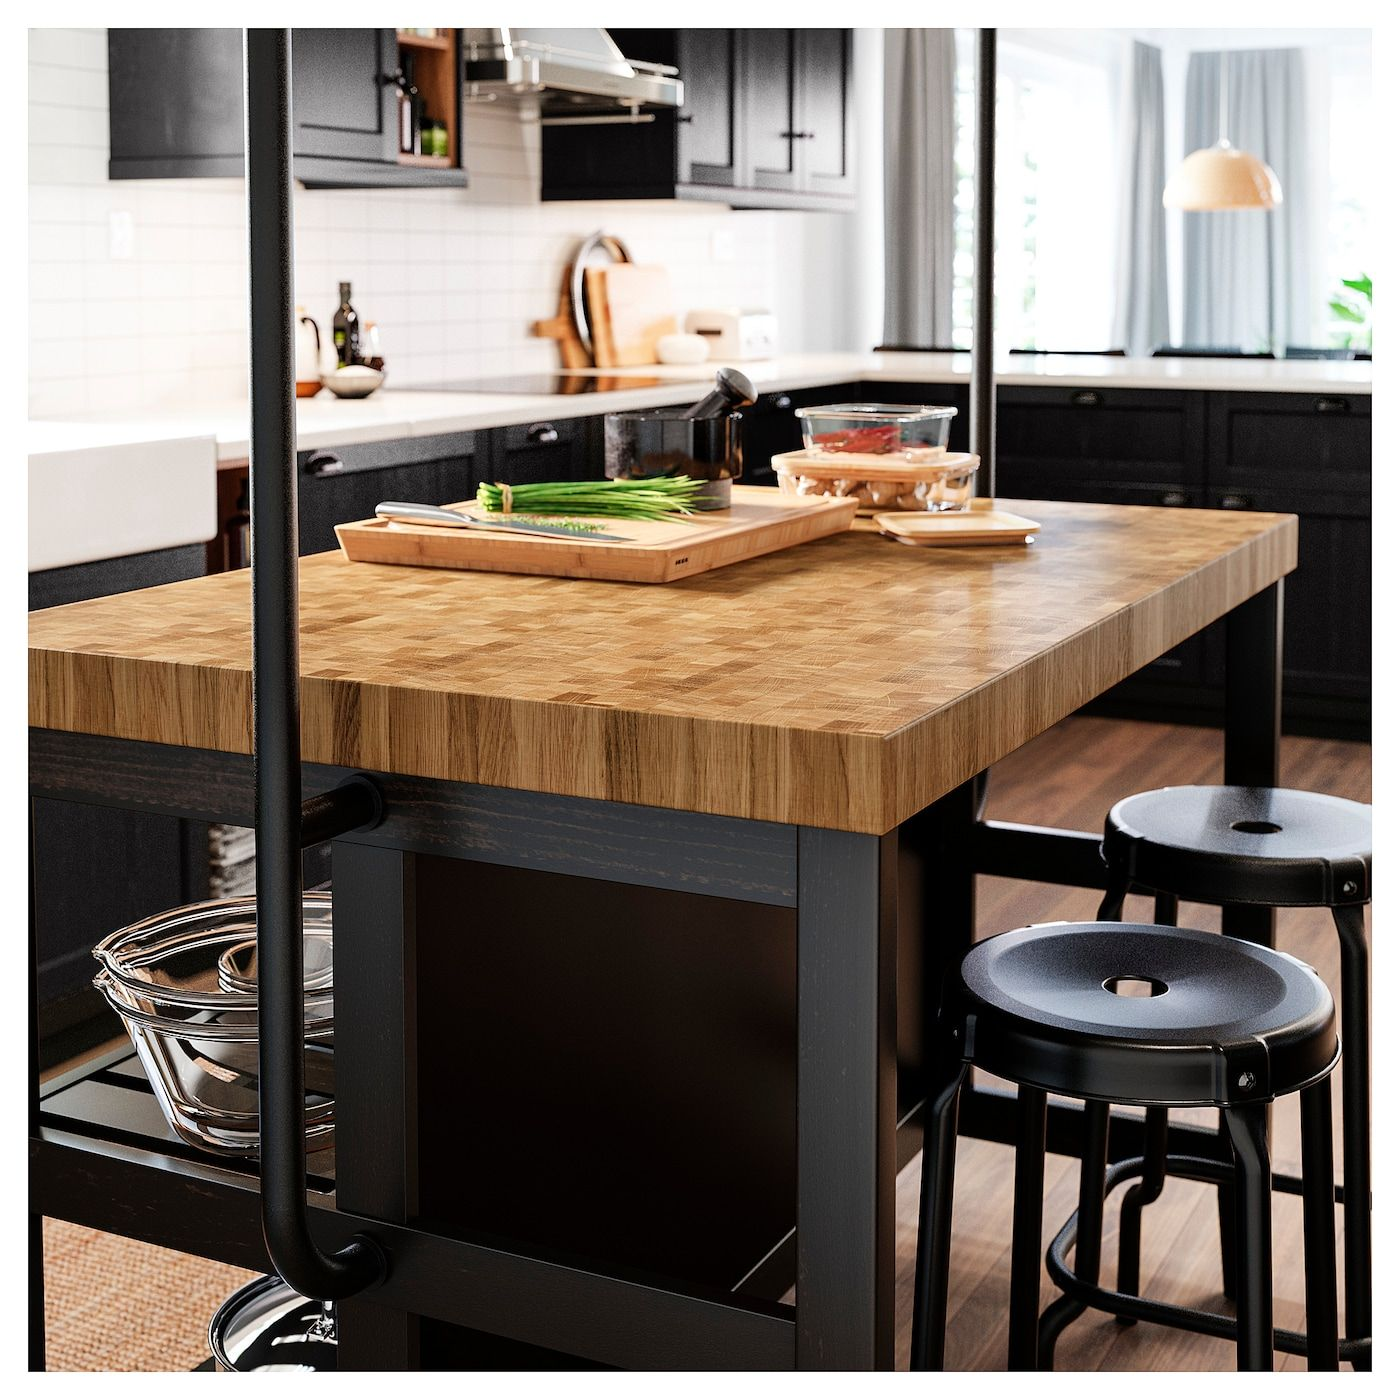 Ambienti Ikea Cucina vadholma kitchen island with rack - black, oak 49 5/8x31 1